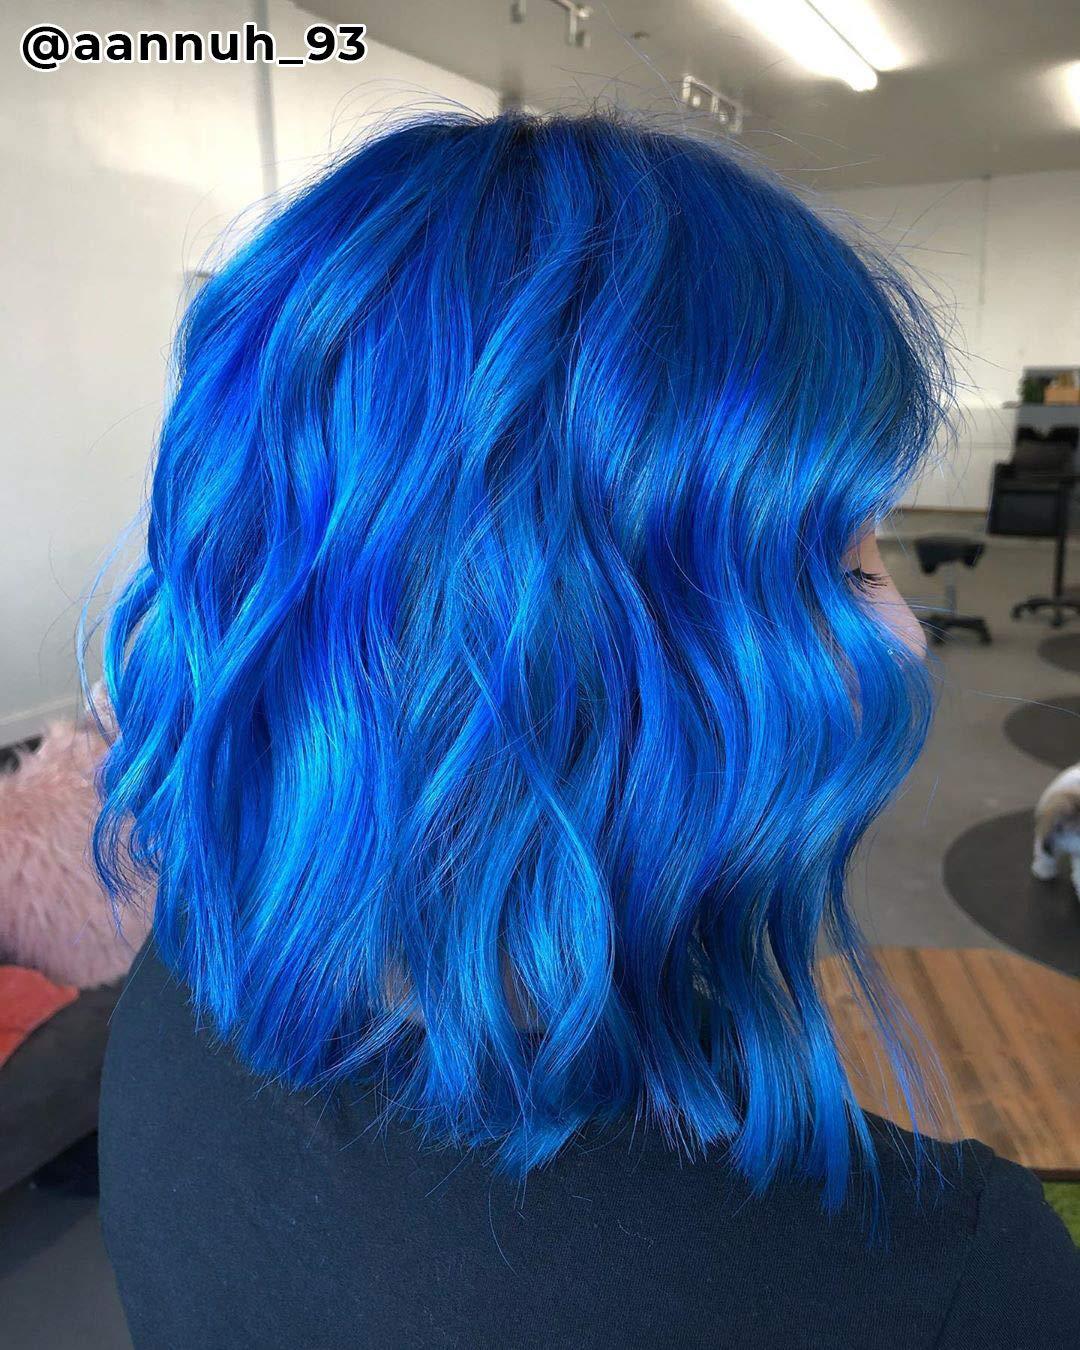 Buy Arctic Fox Semi Permanent Hair Color Dye 4 Ounce